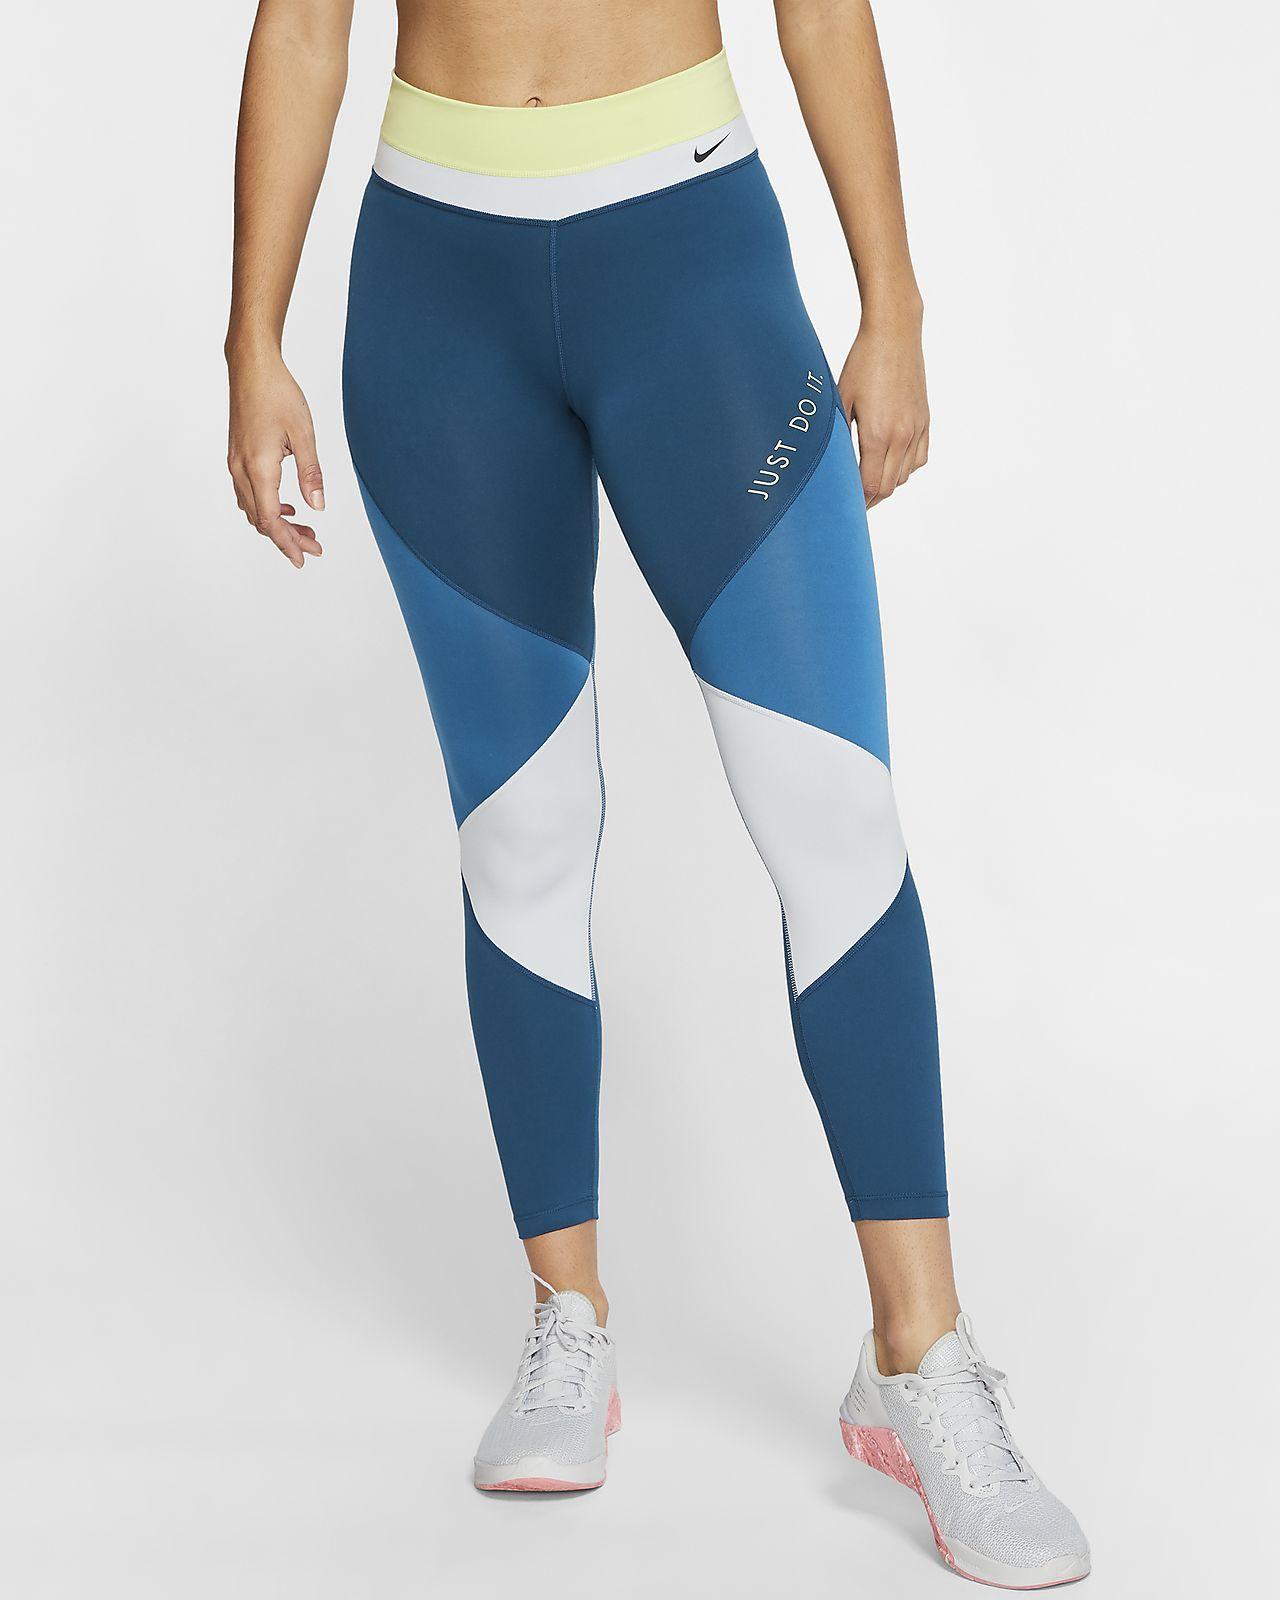 nike one leggings 7/8